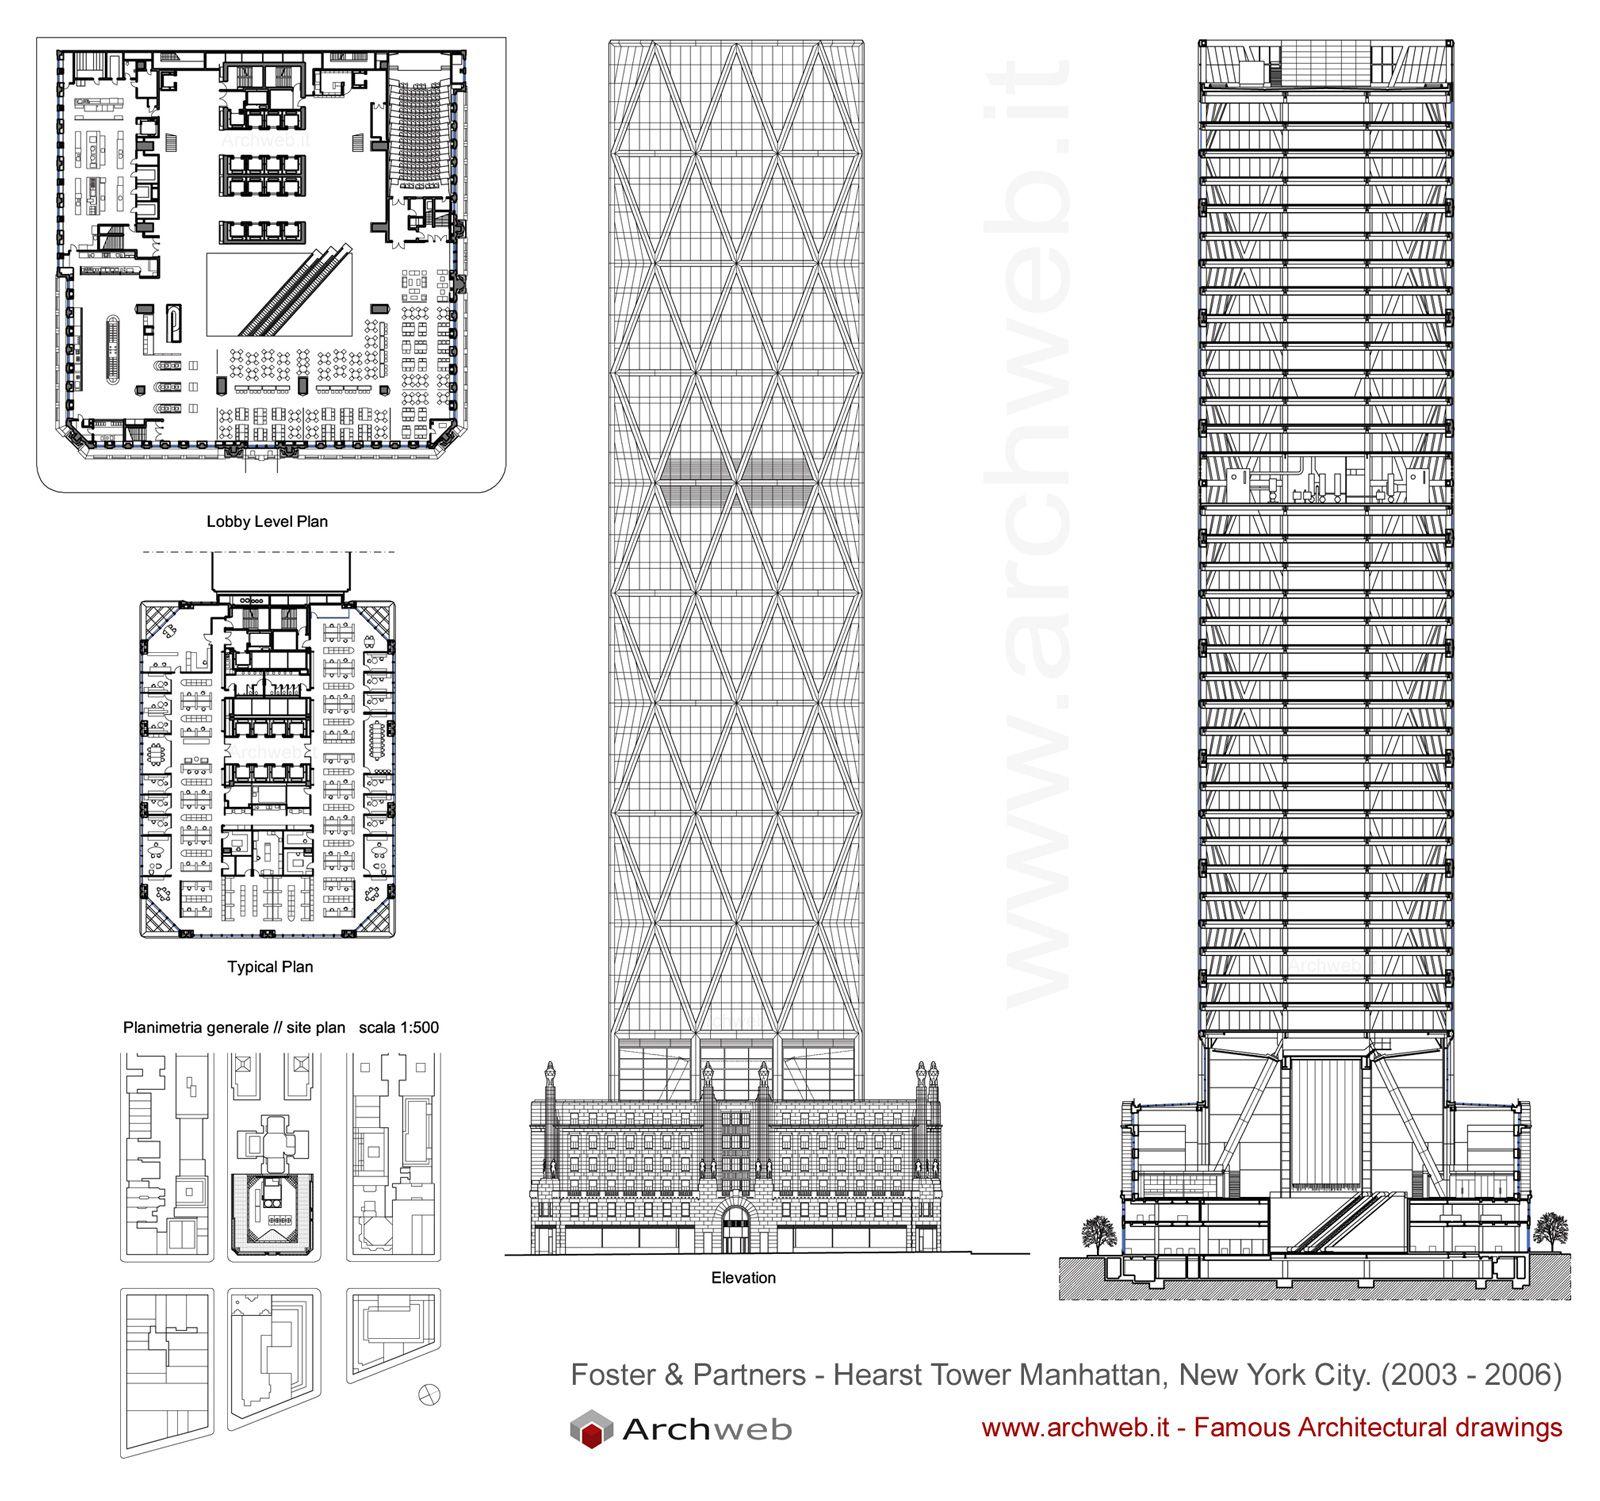 Norman foster and twentieth century architecture